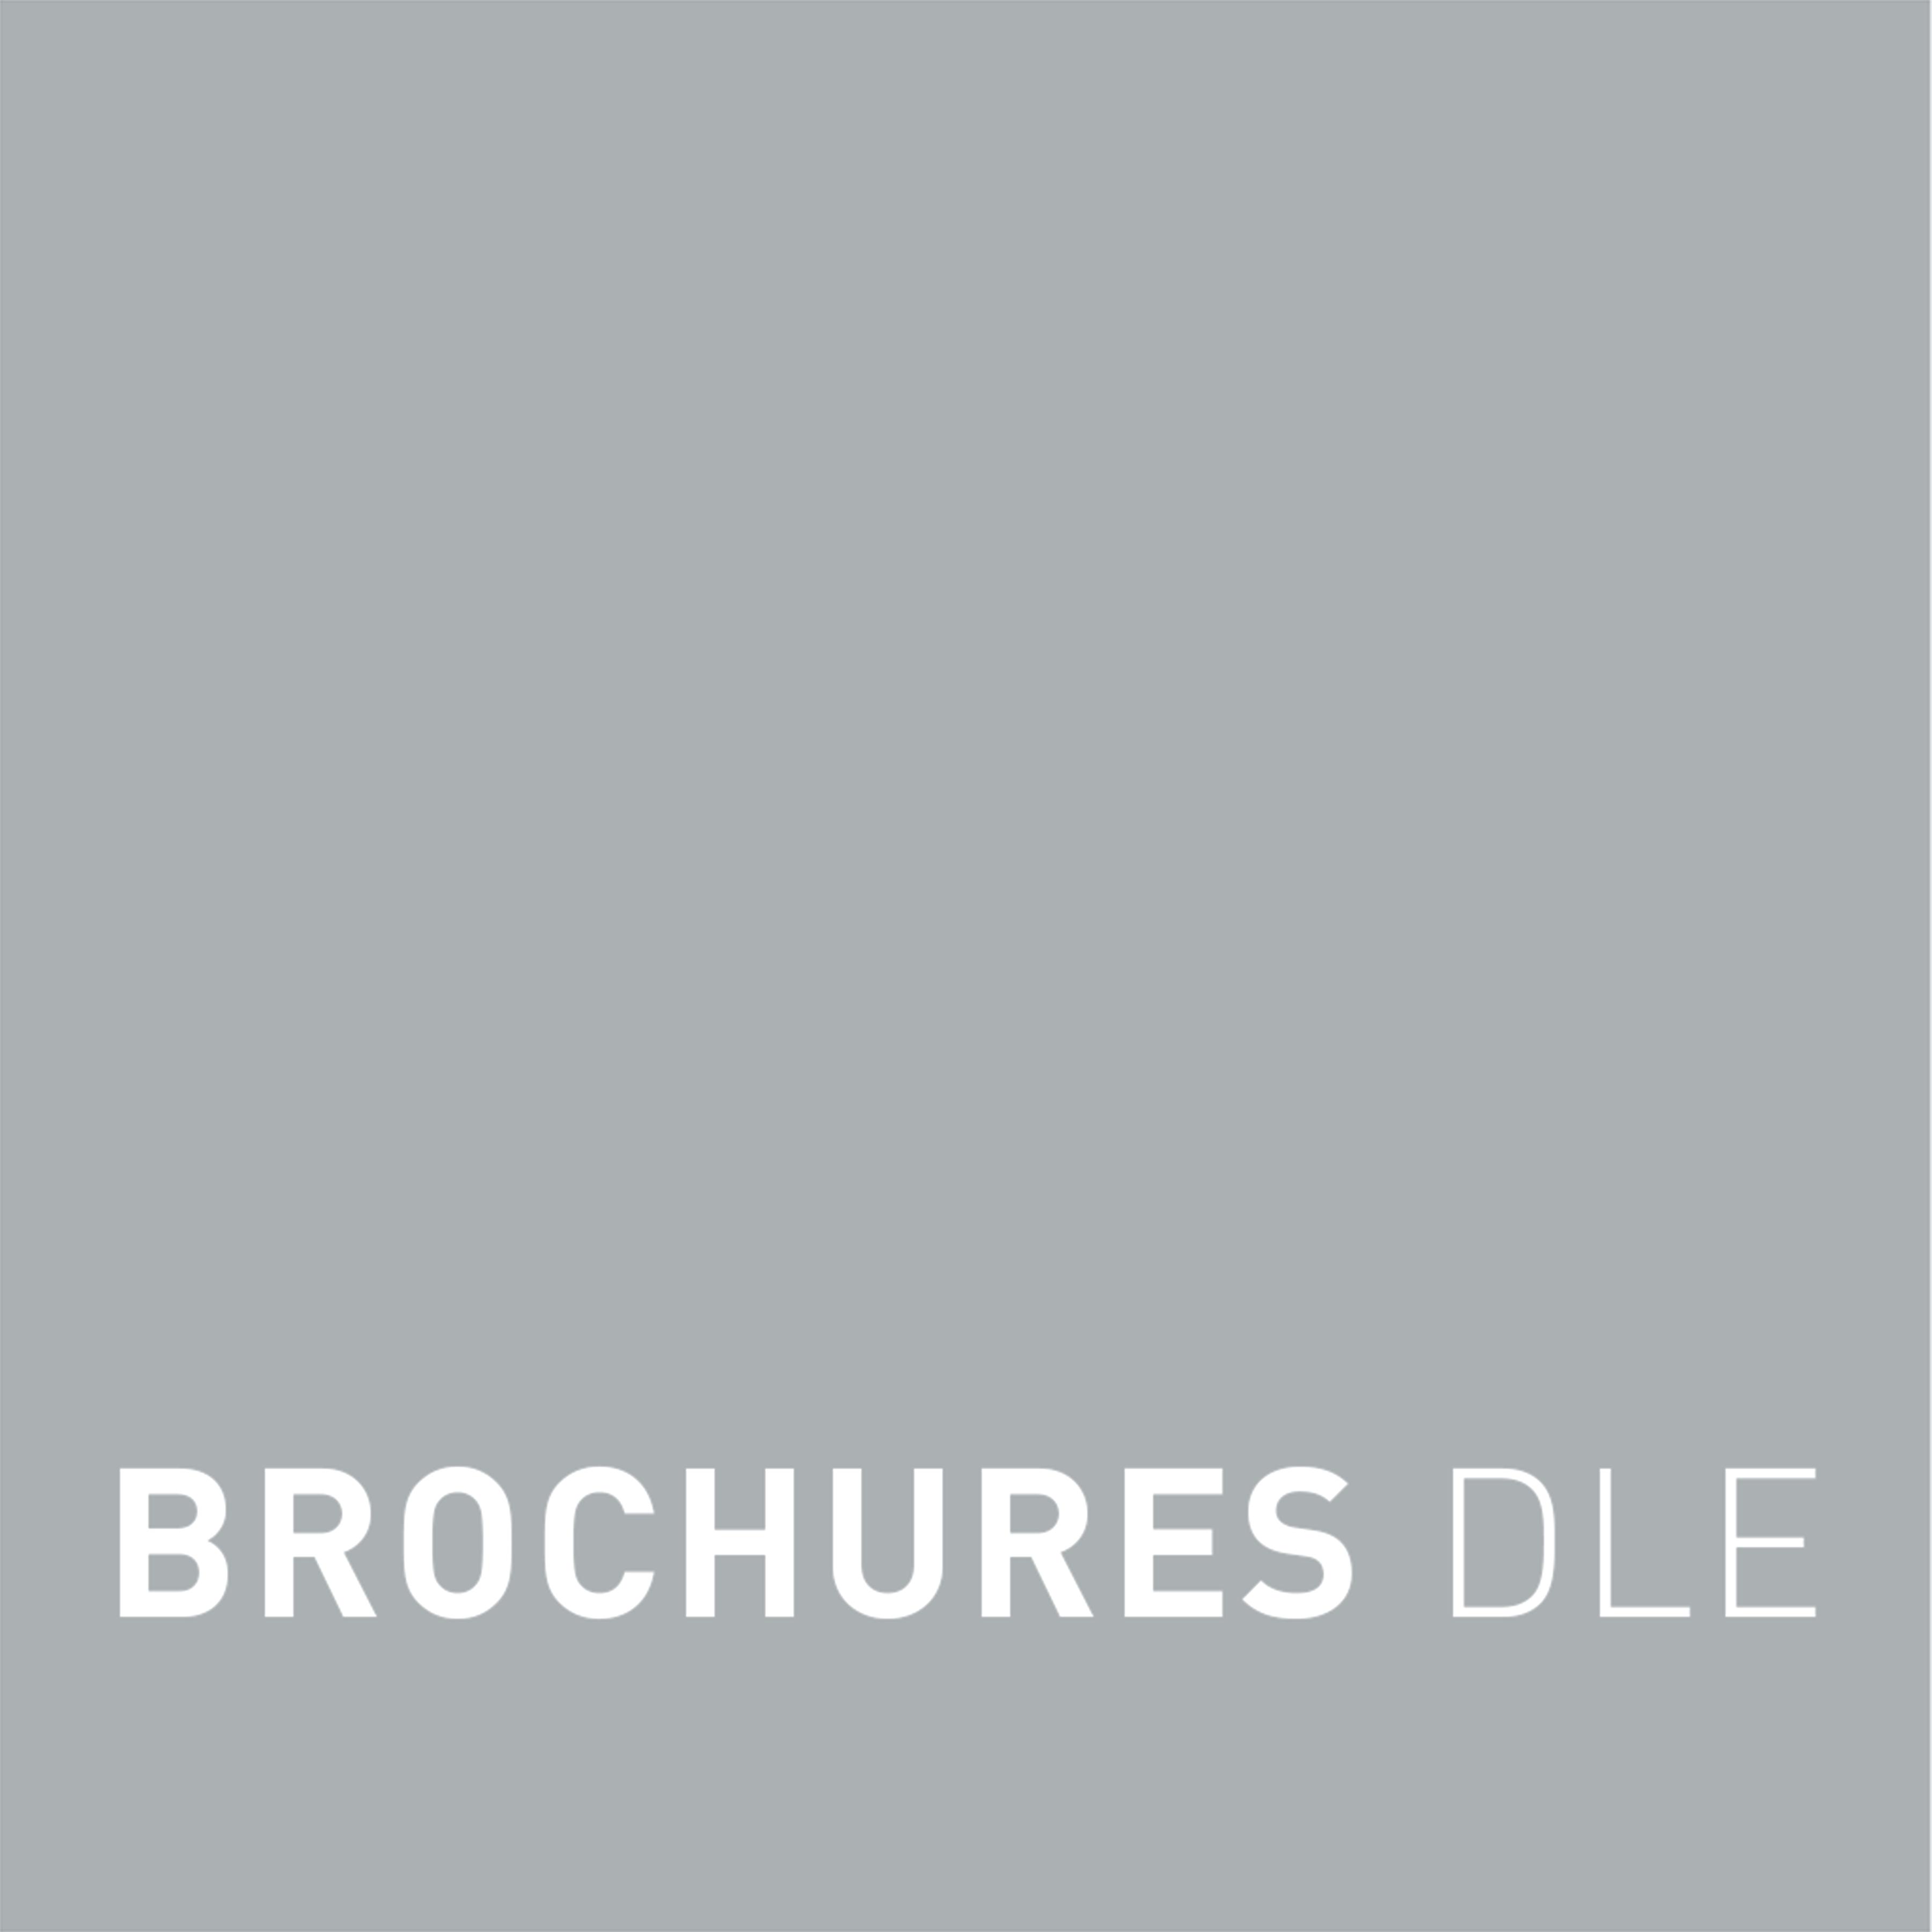 DLE brochures